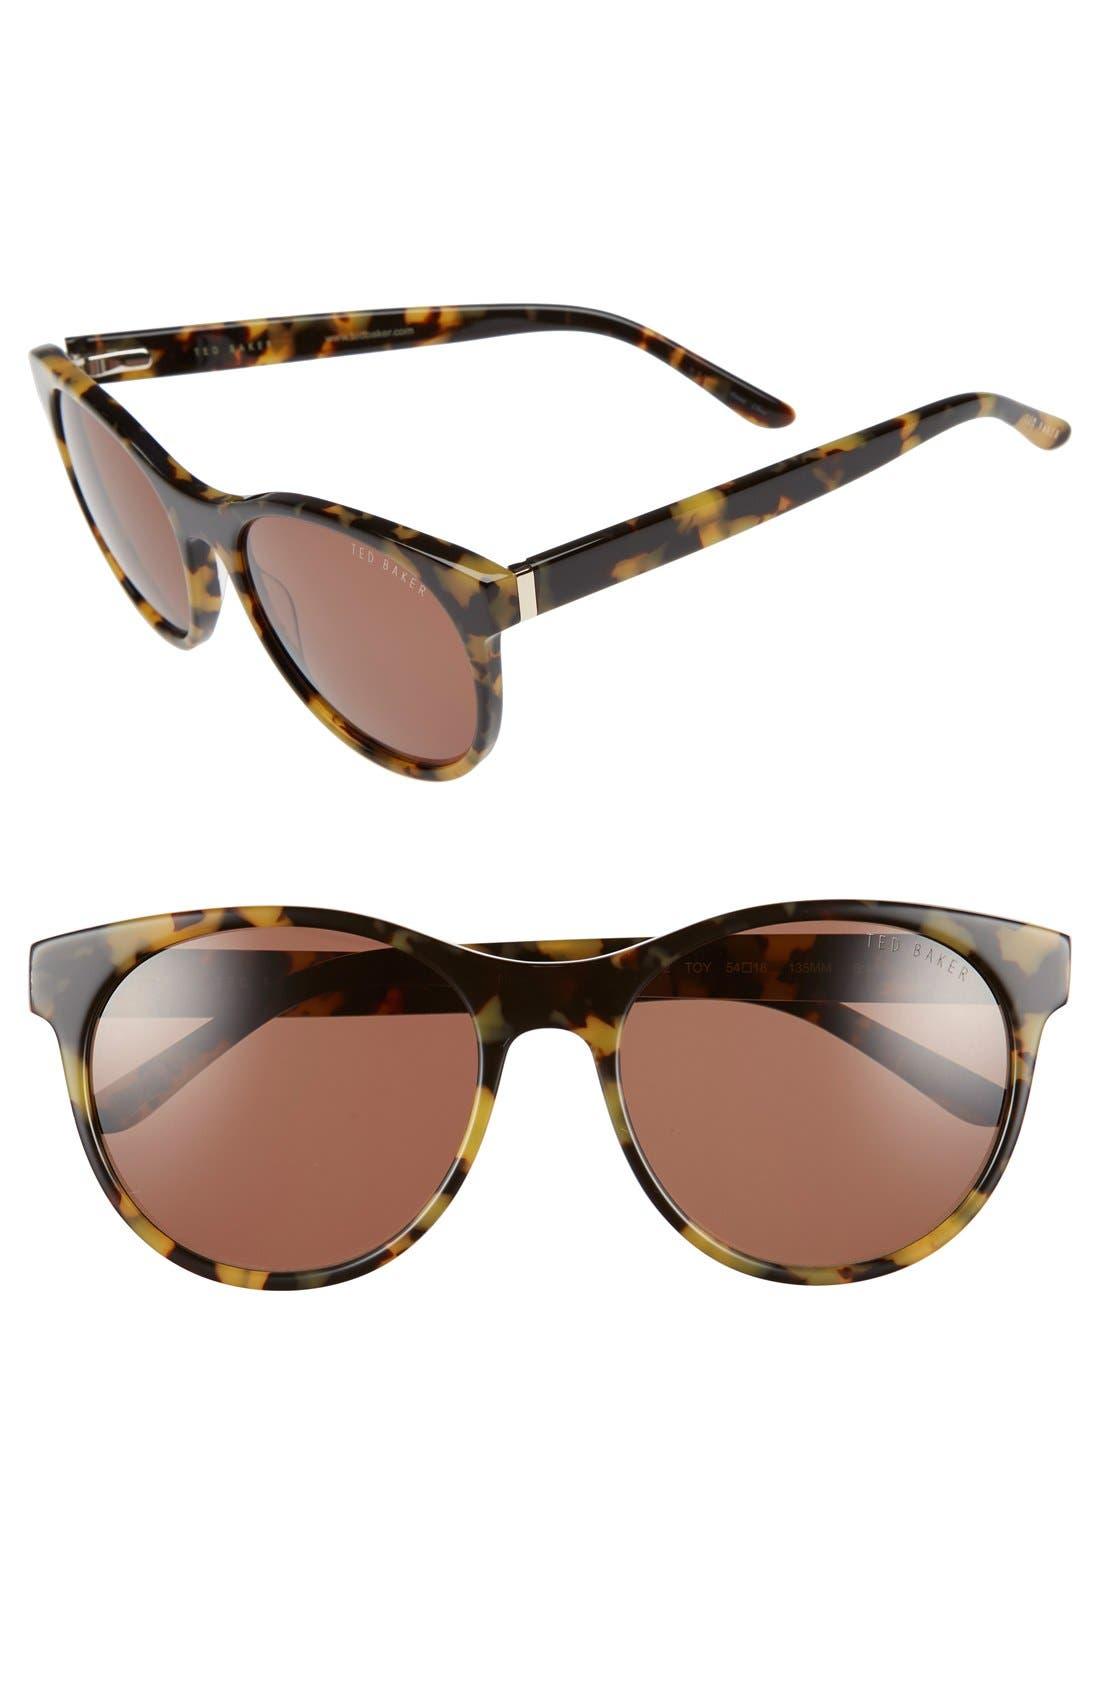 54mm Retro Sunglasses,                         Main,                         color, Tokyo Tortoise